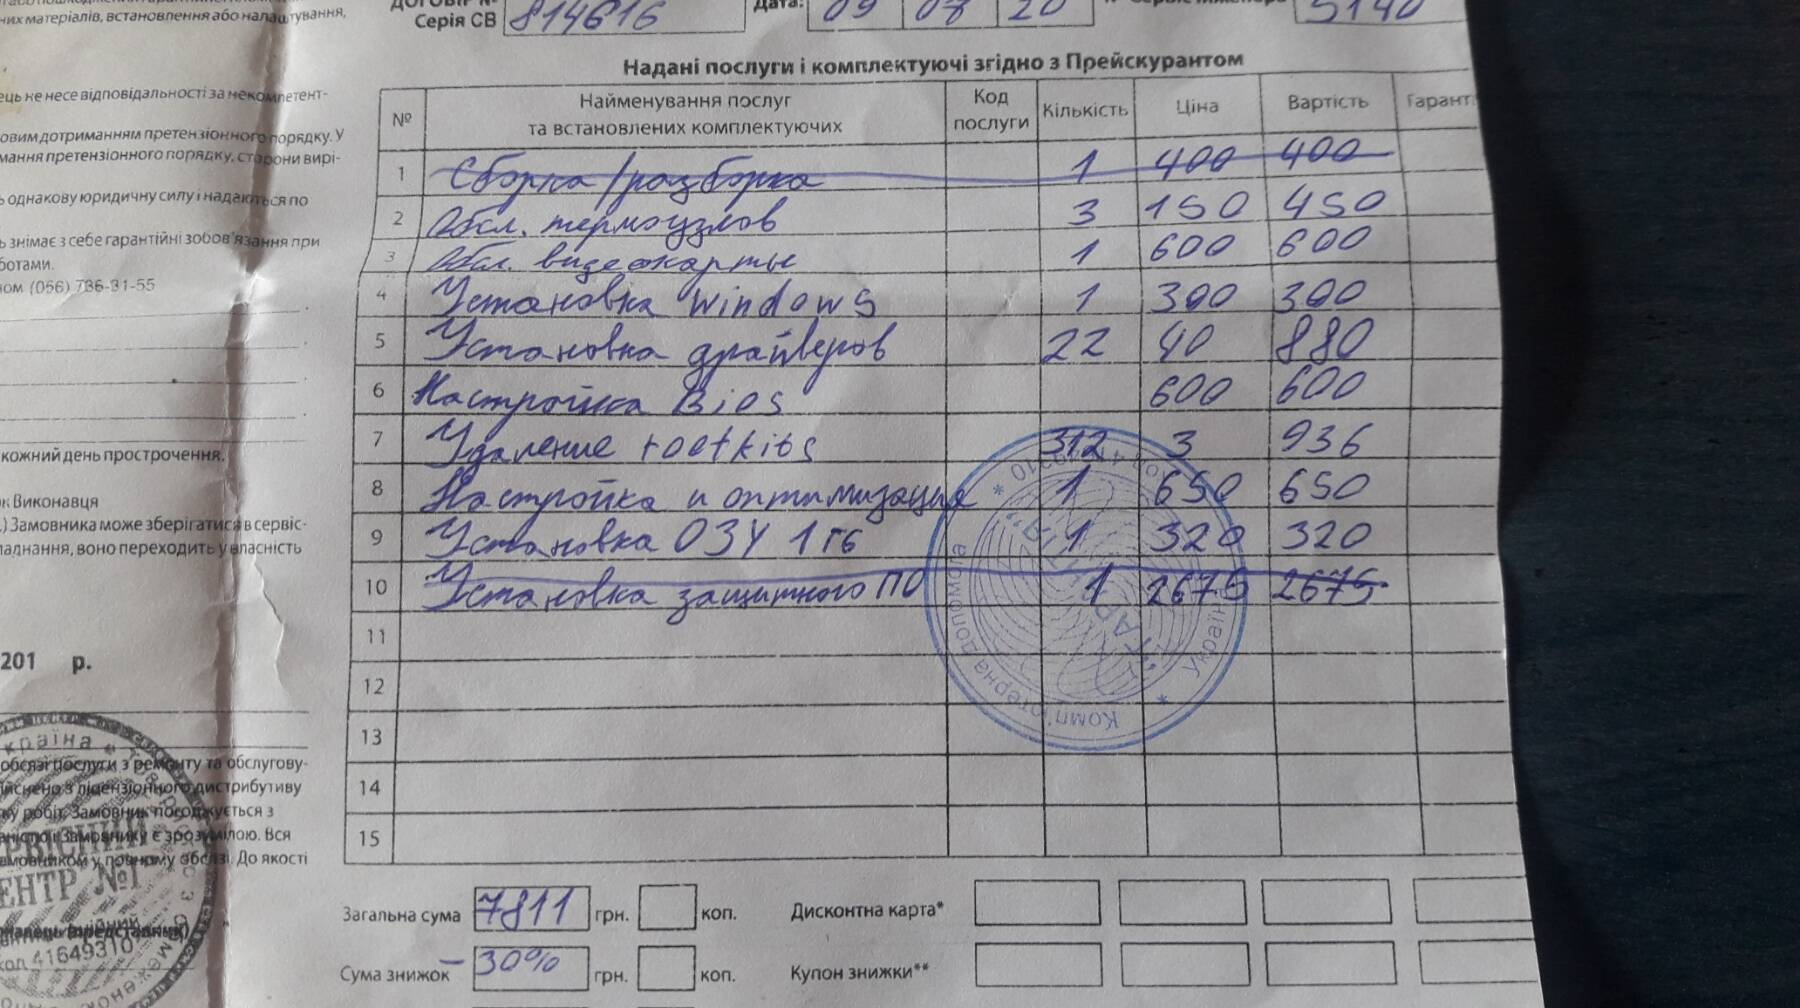 Счет на оплату услуг. Фото очевидцев